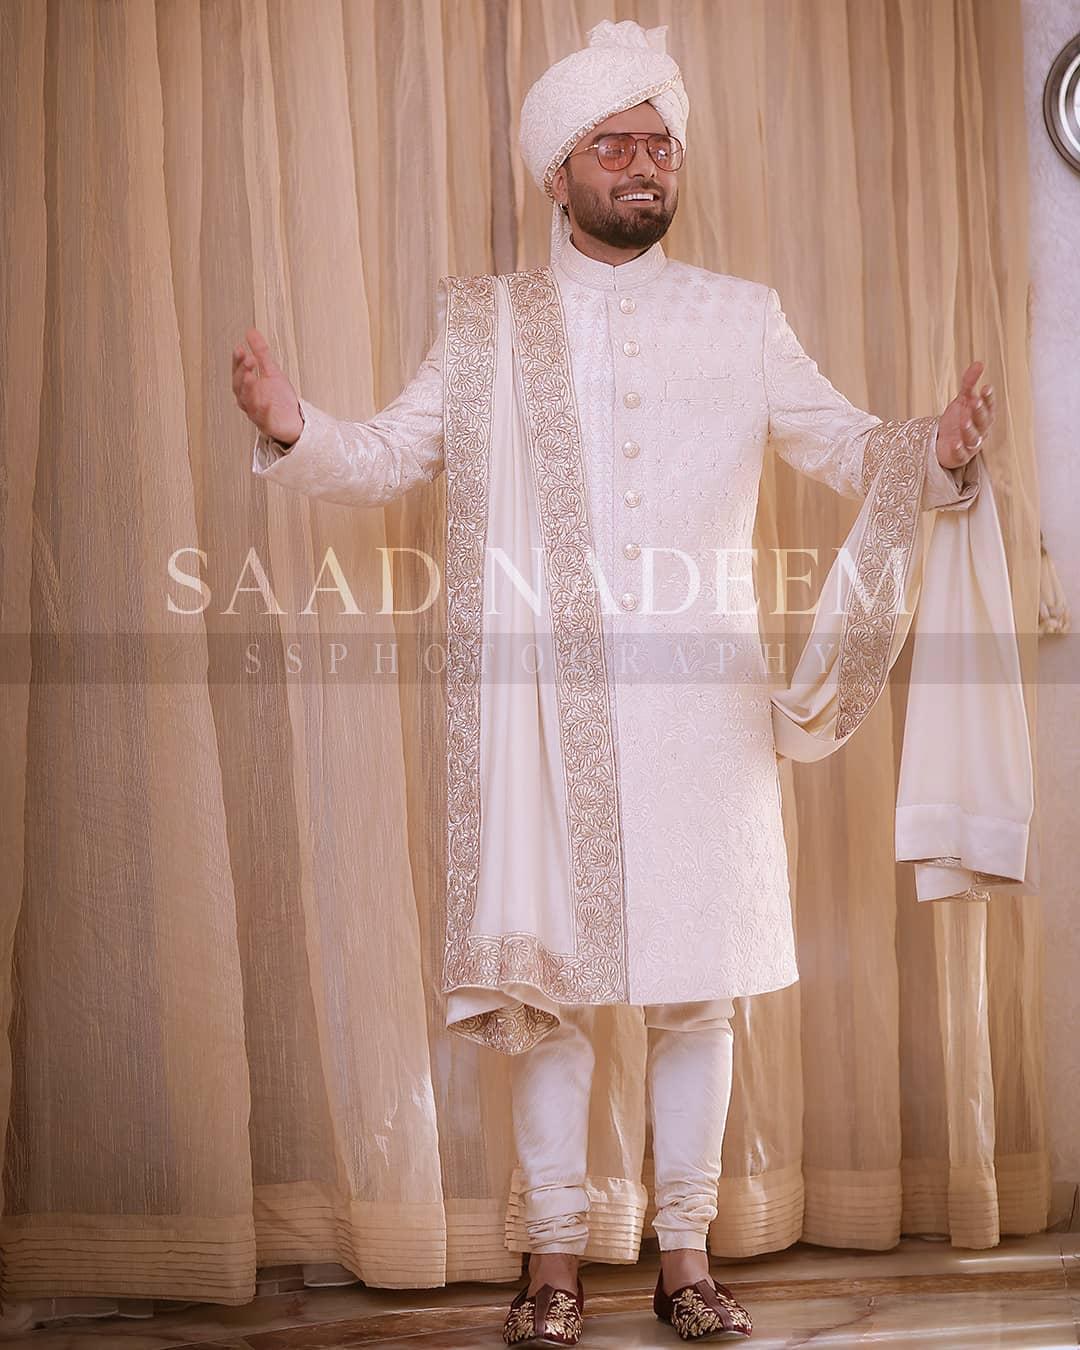 Iqra Aziz and Yasir Hussain Wedding Pictures (32)